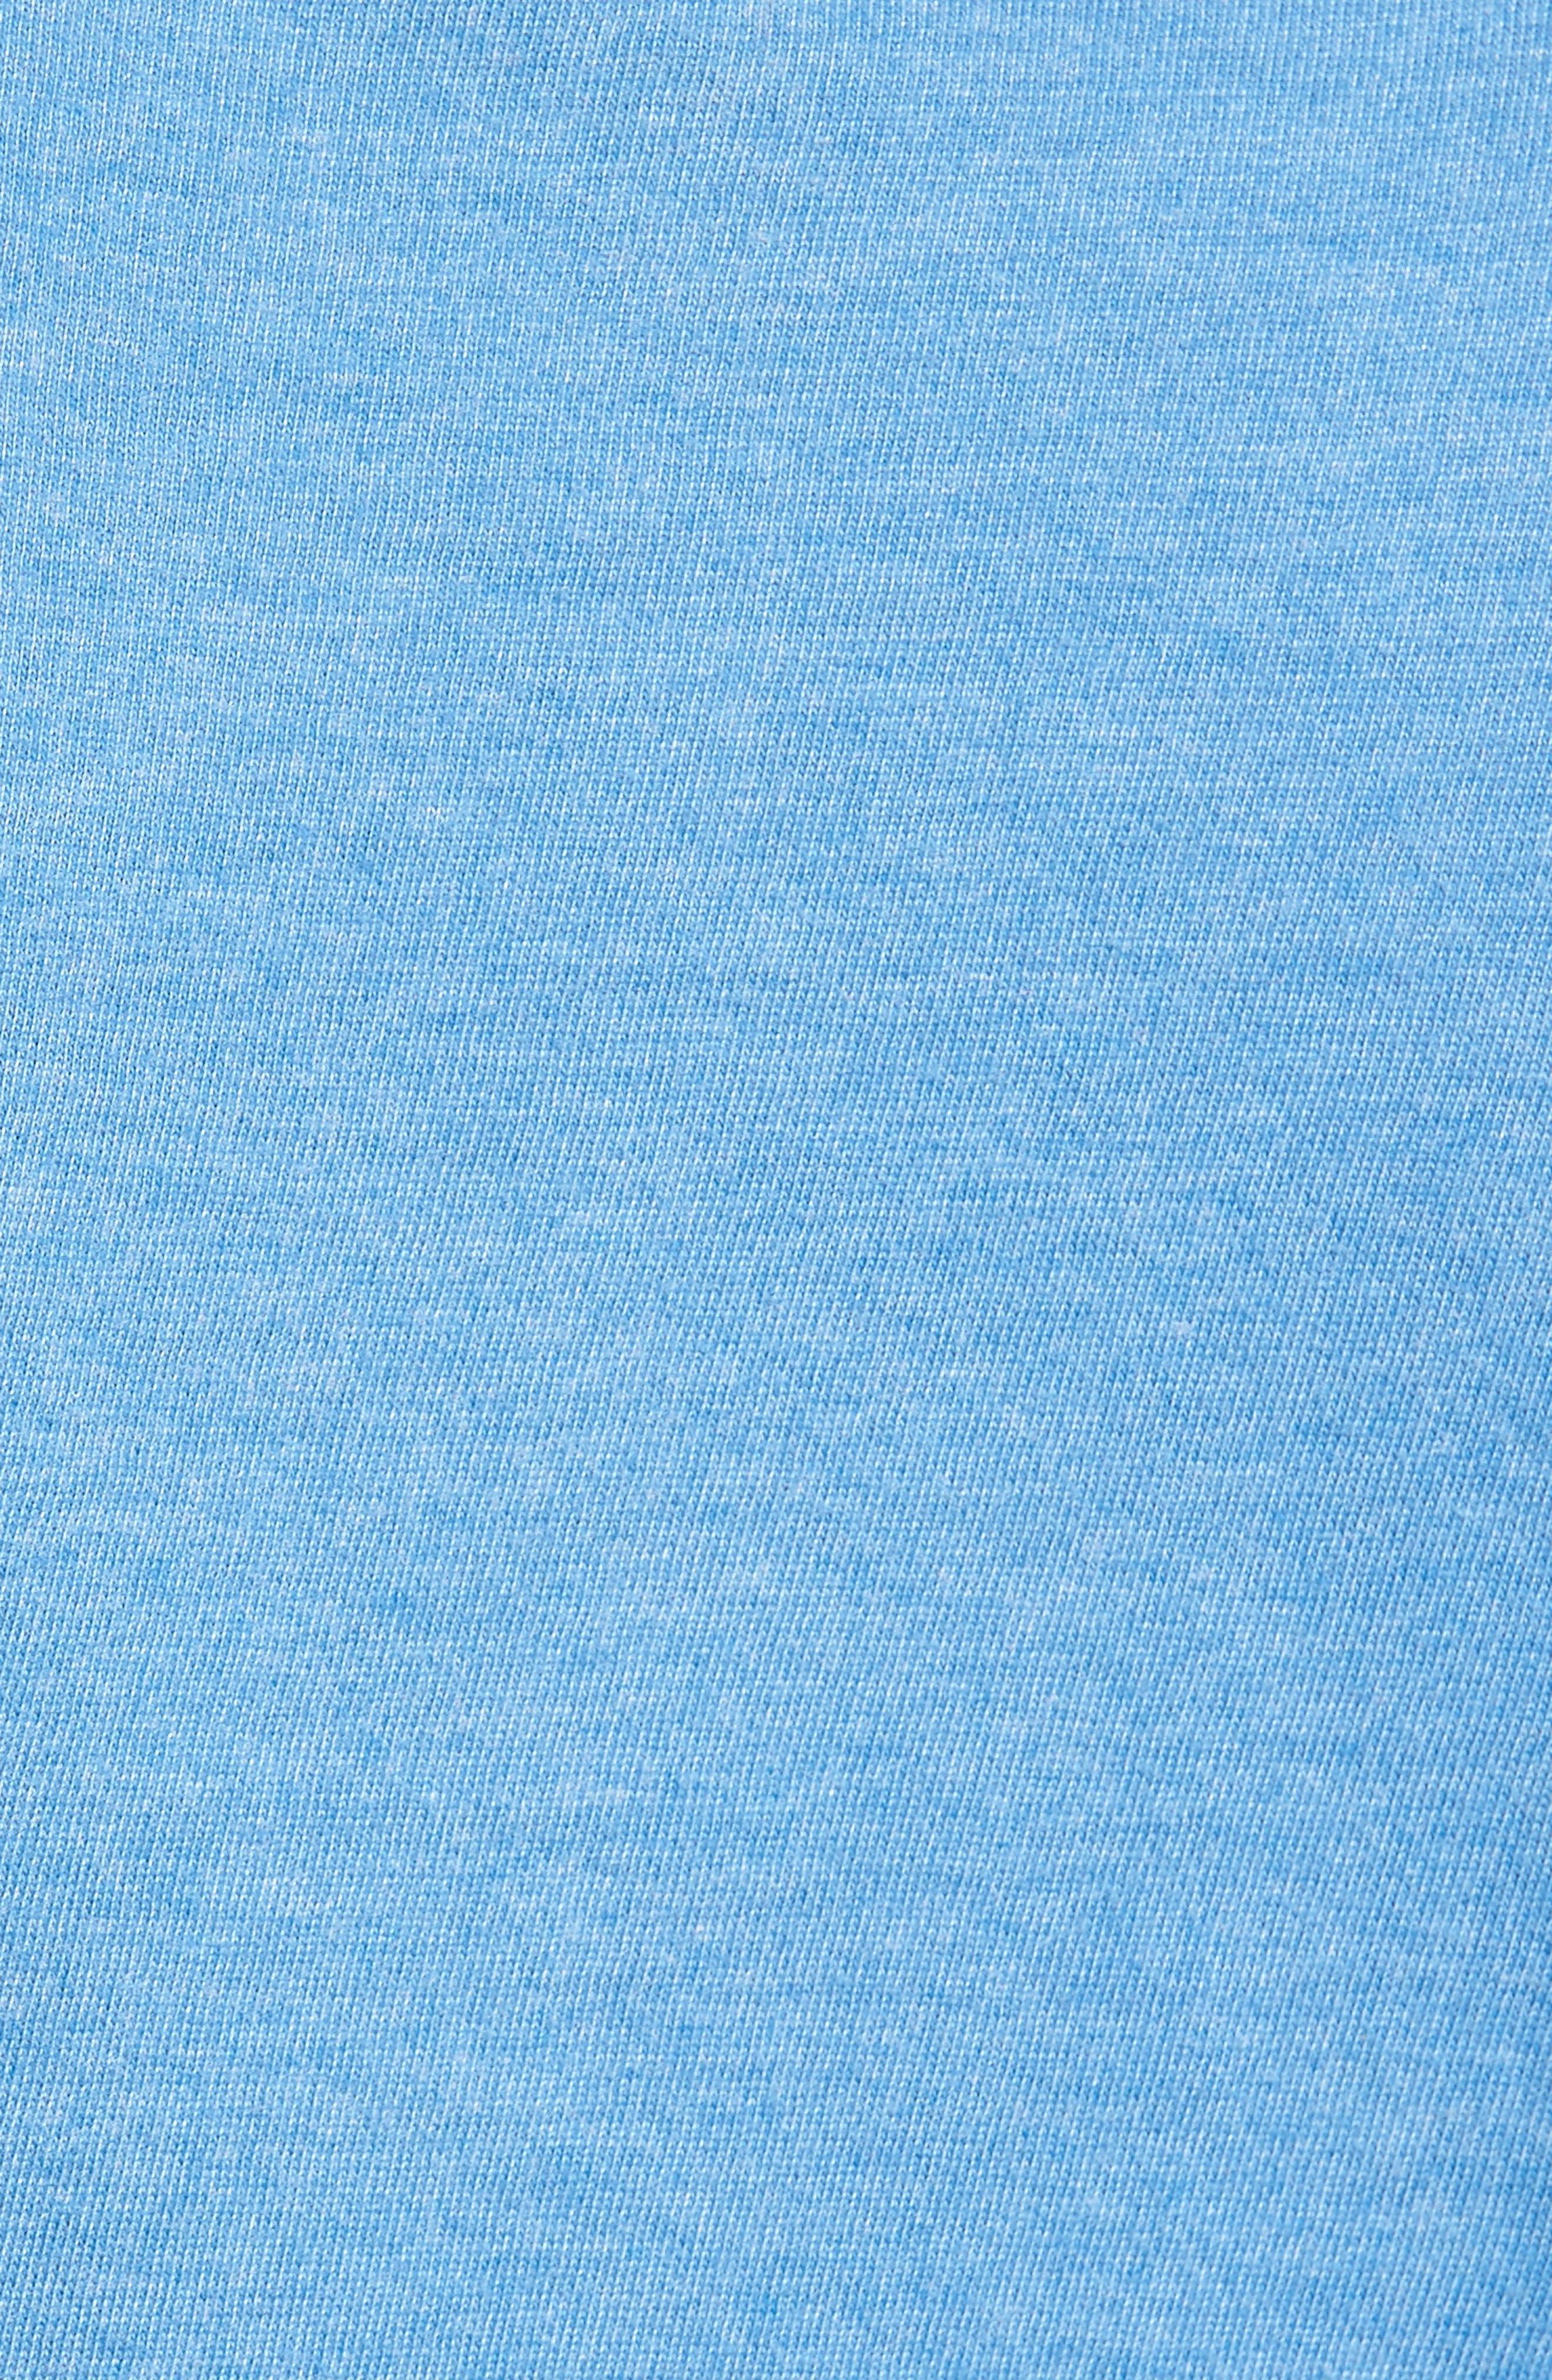 Hillwood Chicago Cubs T-Shirt,                             Alternate thumbnail 5, color,                             450